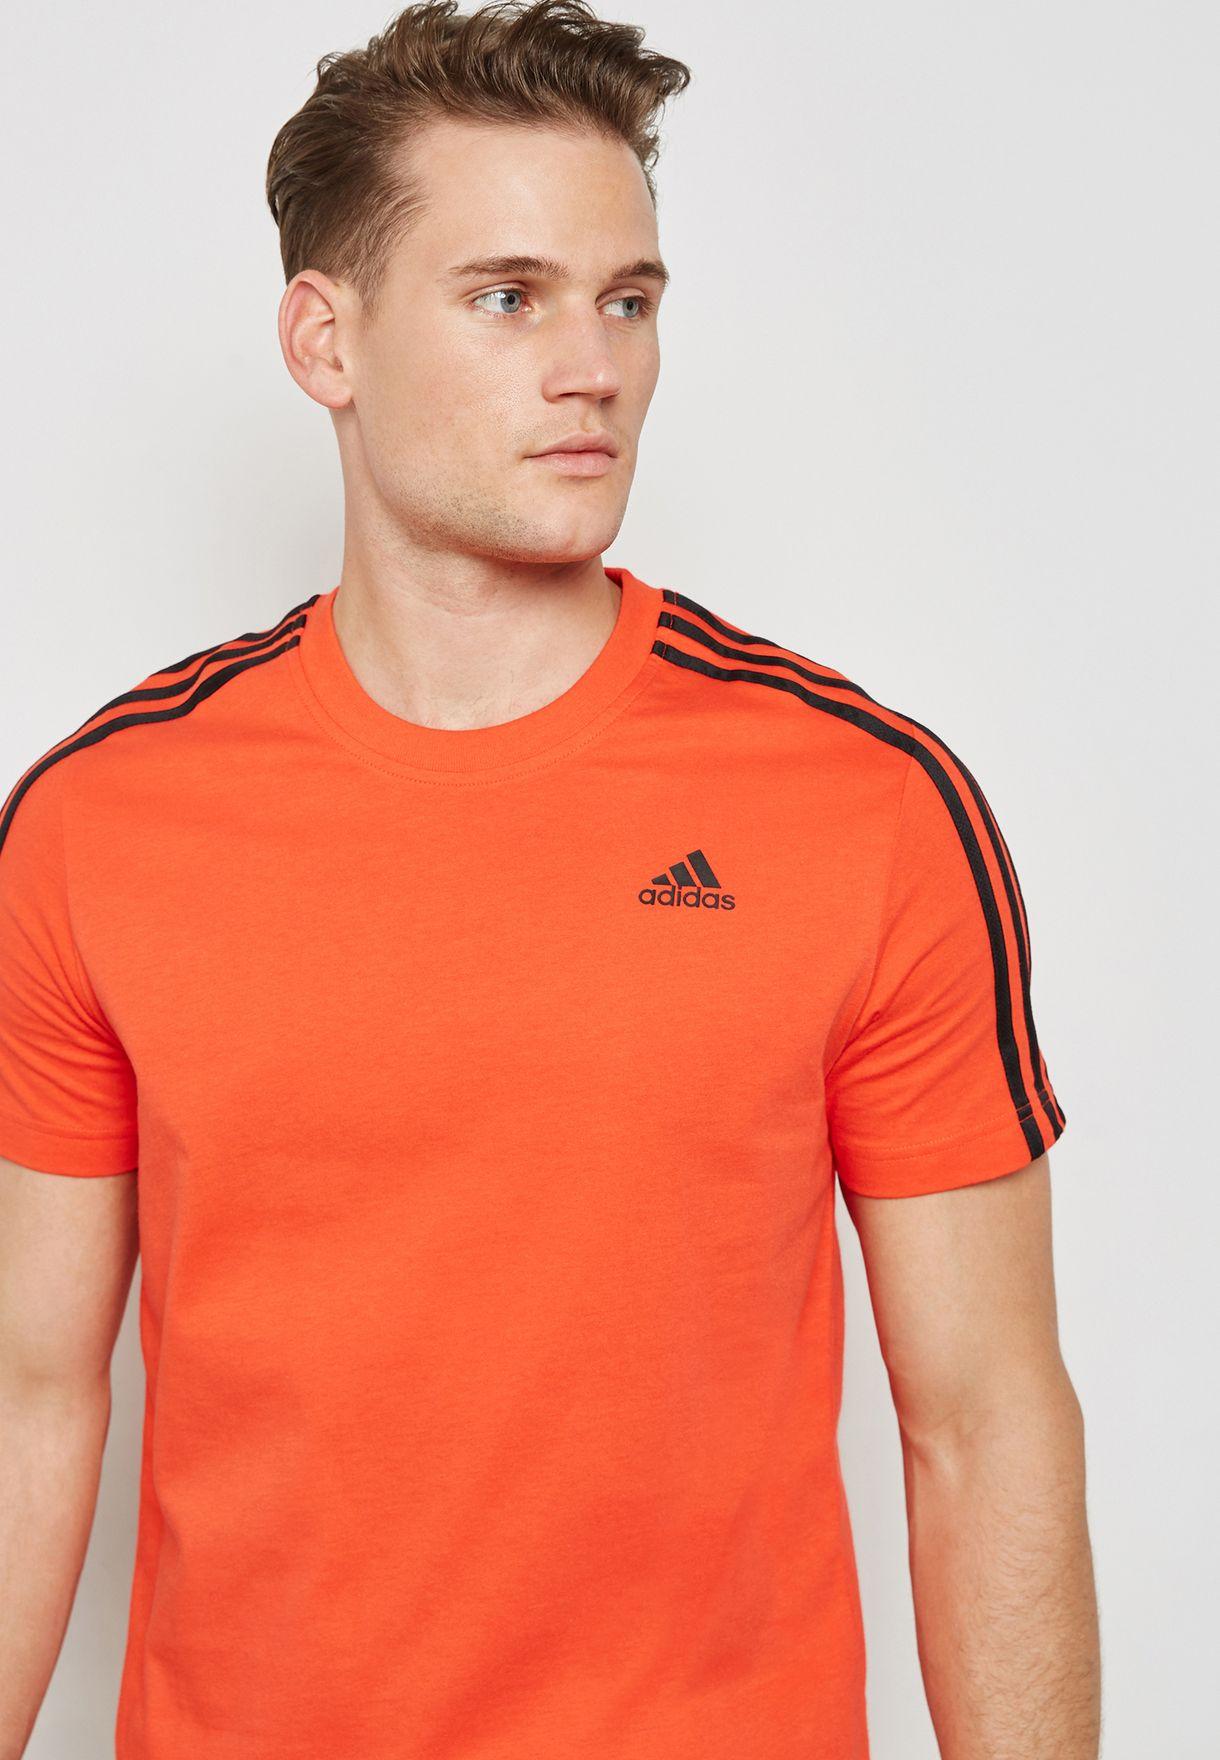 adidas Essentials 3 Stripes T Shirt Men Orange